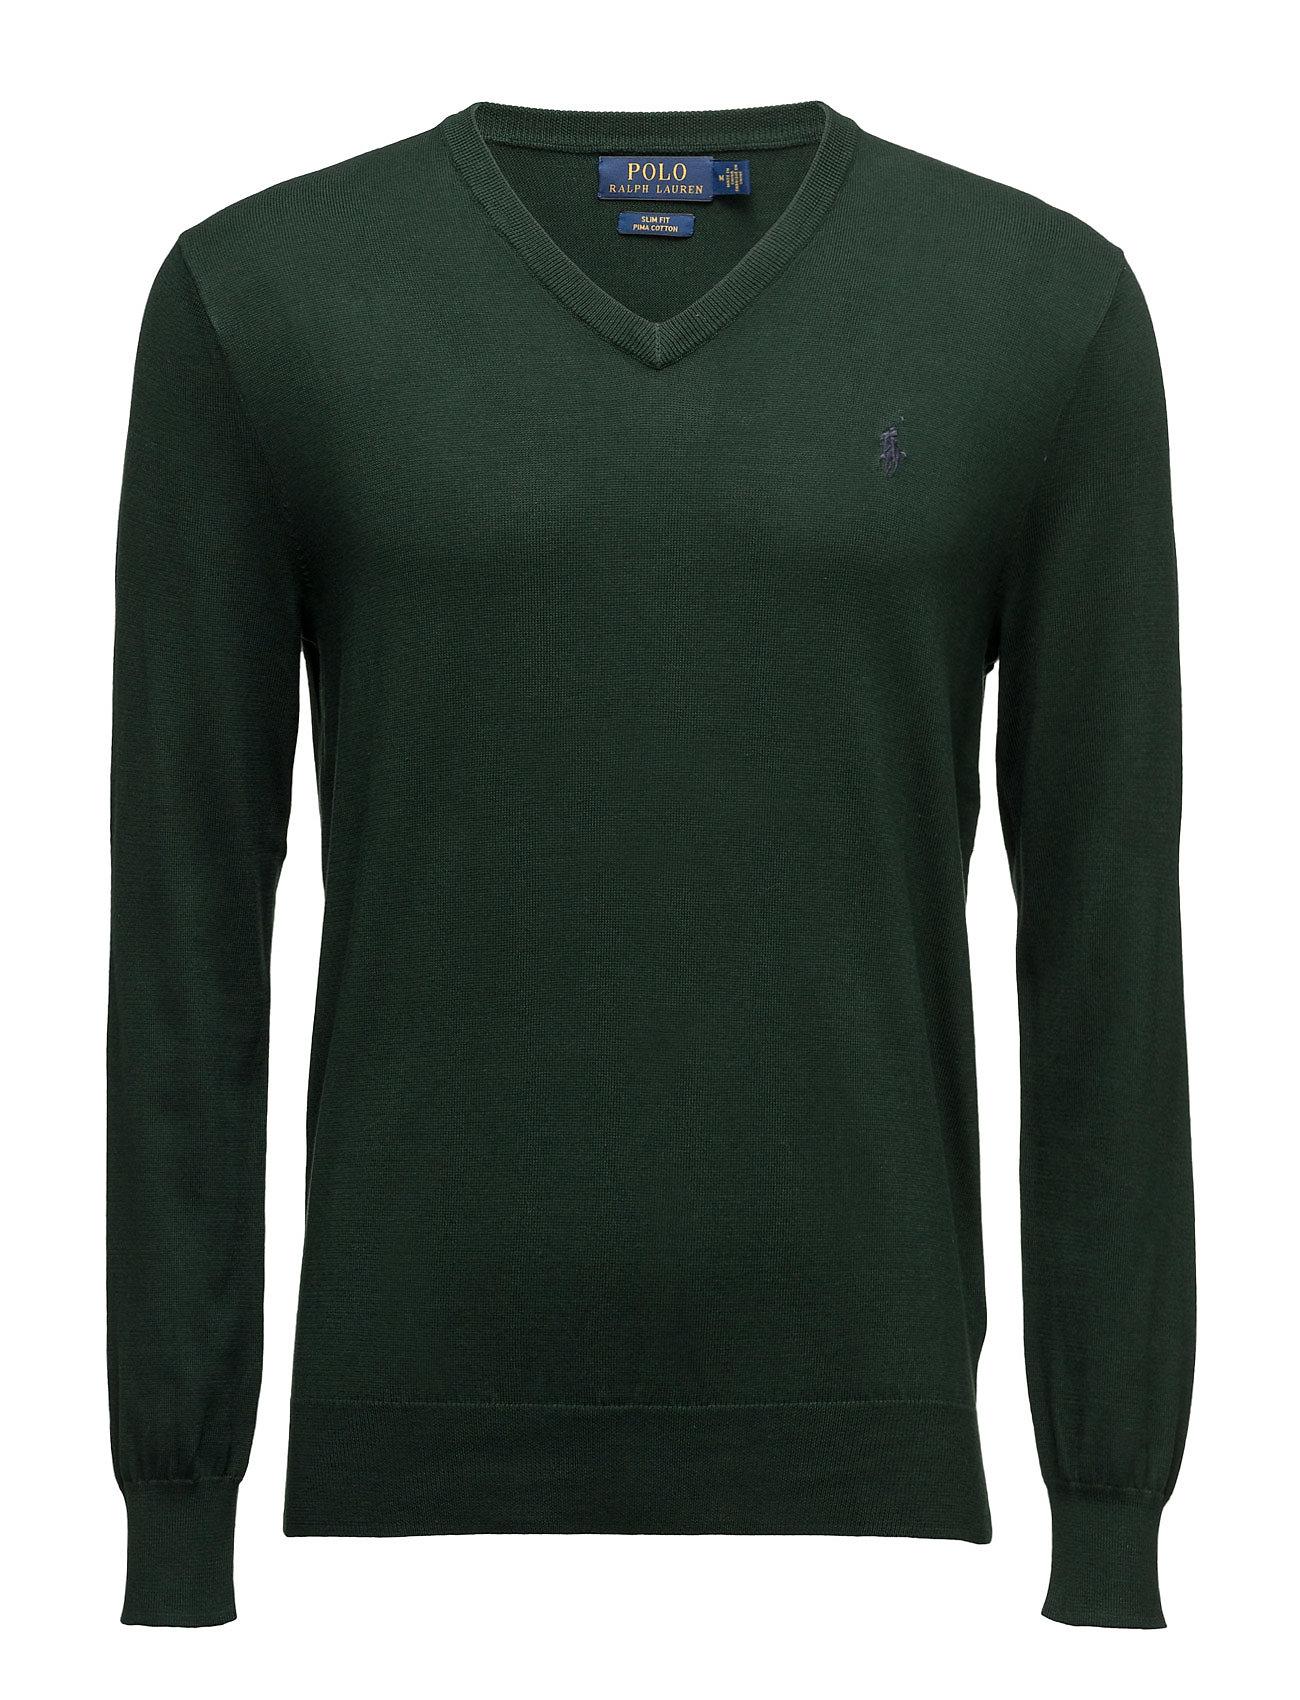 Polo Ralph Lauren Slim Fit Pima Cotton V-Neck Sweater